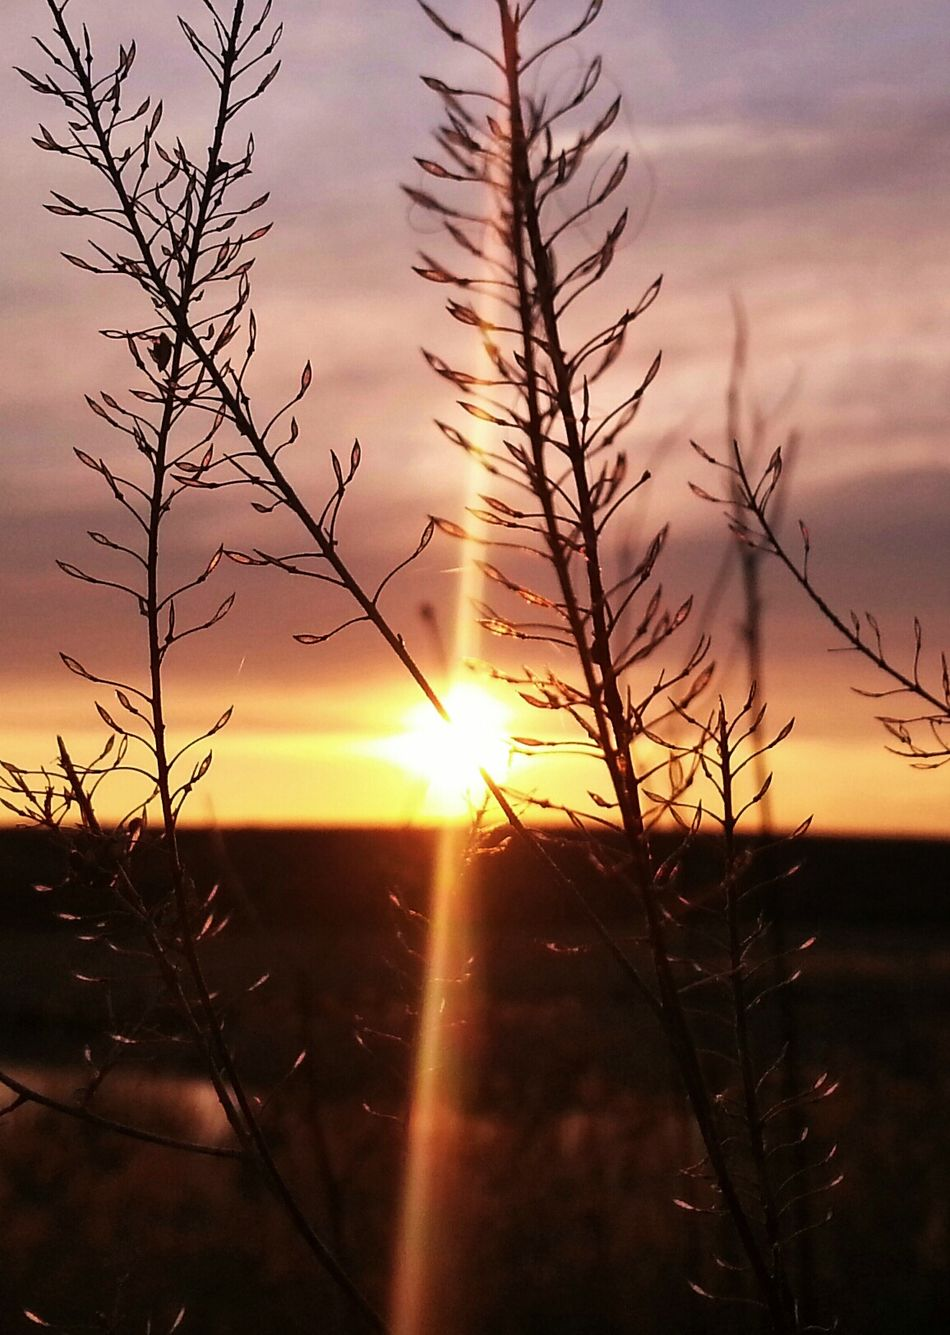 EyeEm Nature Lover Sunset_collection Eye Em Best Shots Sunset Silhouettes